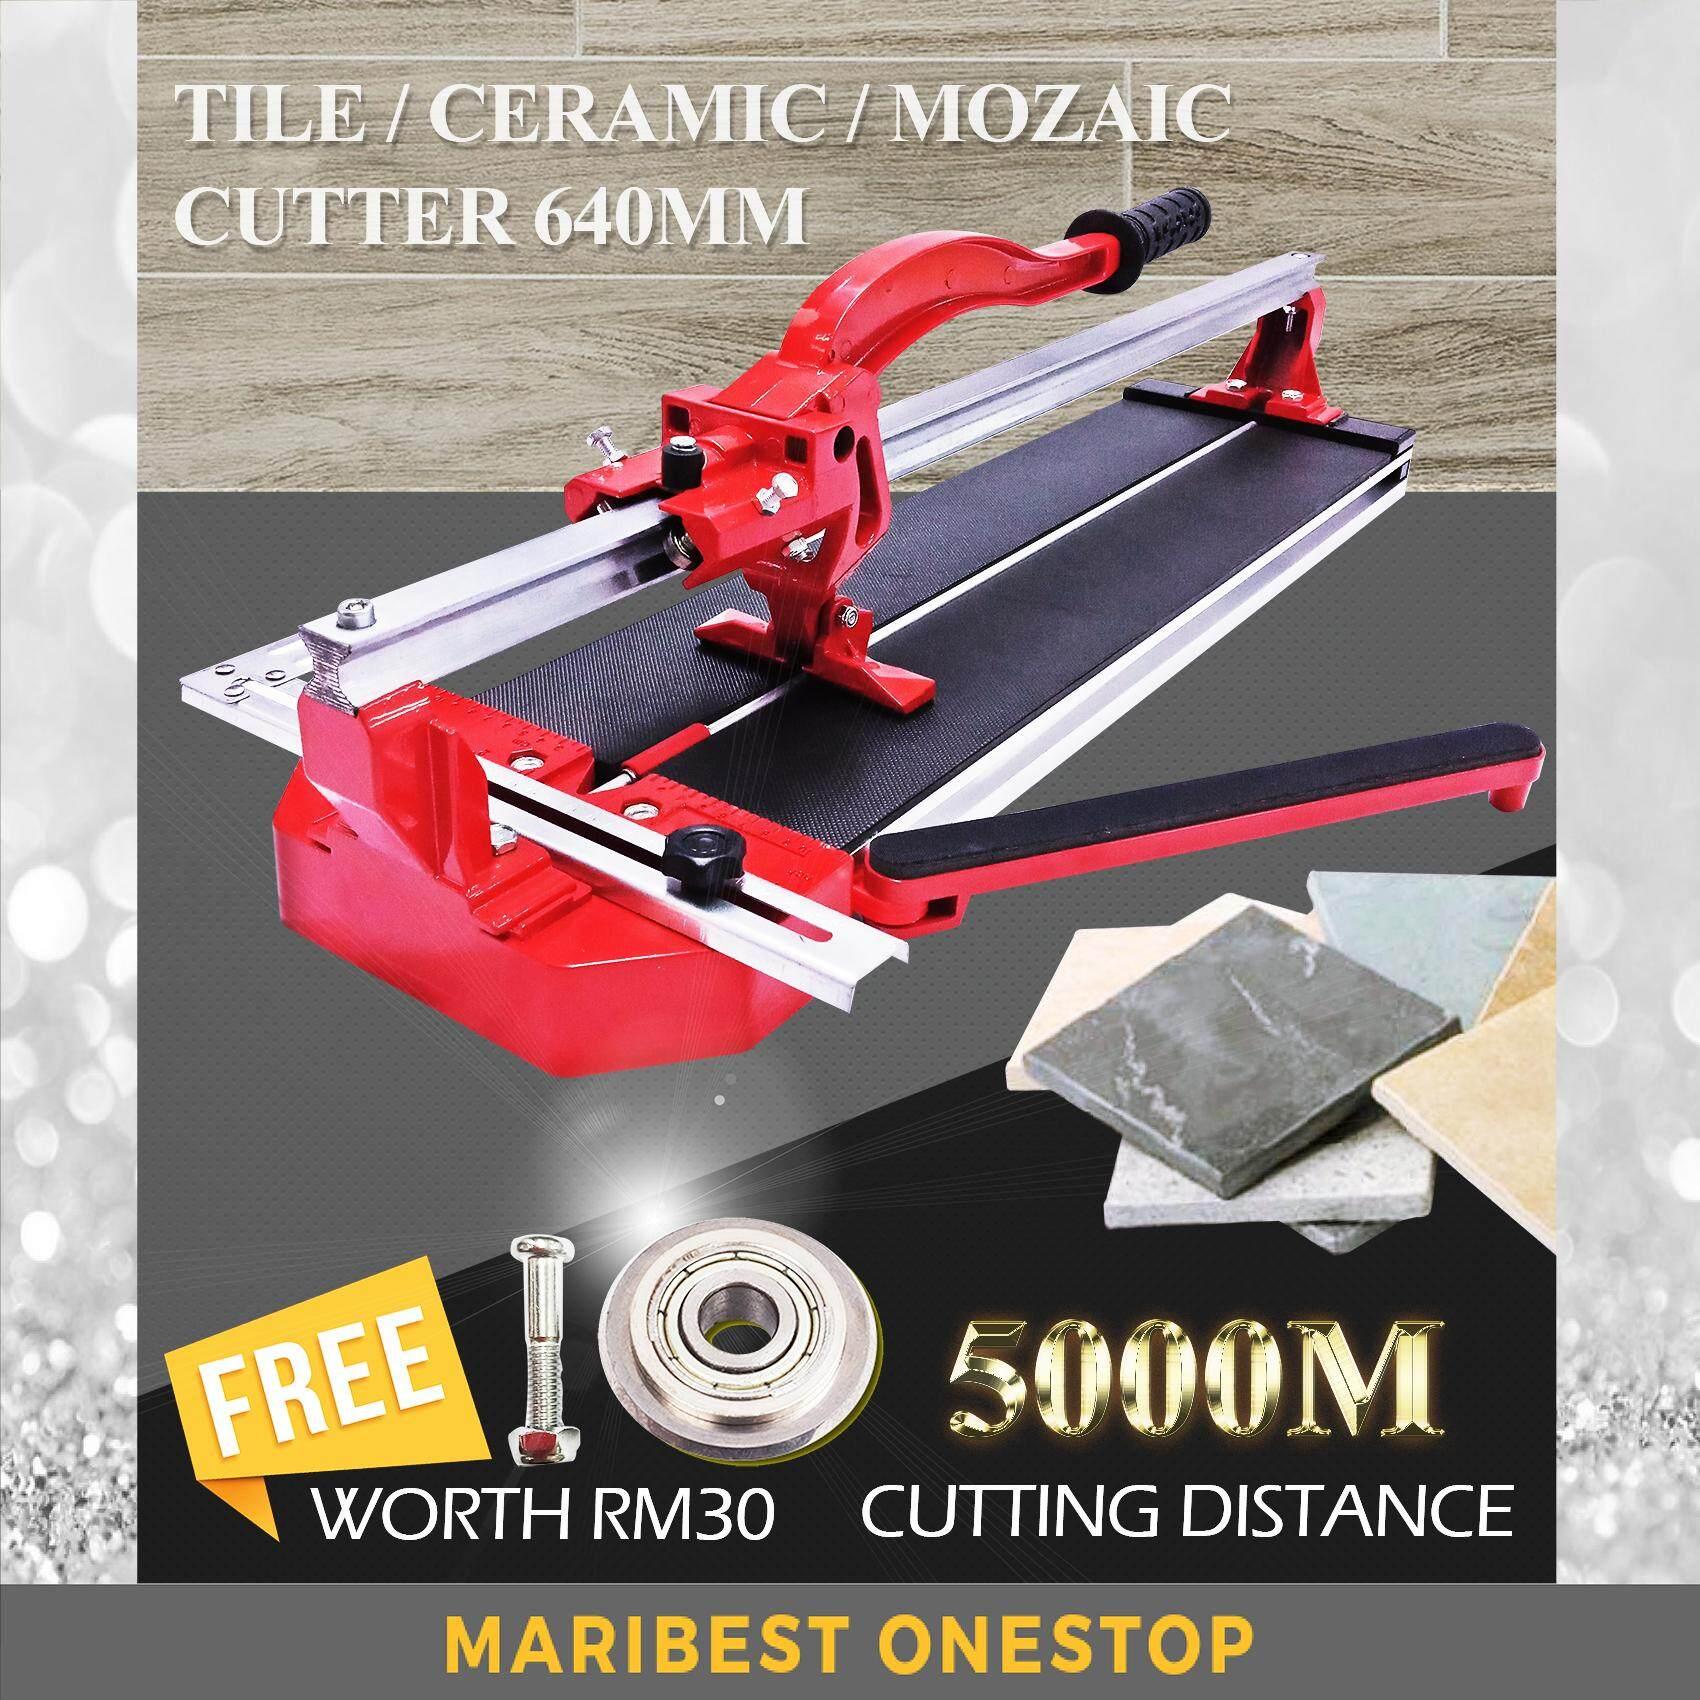 FINDER FD830-1 Heavy Duty 640MM Tile Cutting Machine Mozaic Cutter Free 1Pcs Cutting Wheel